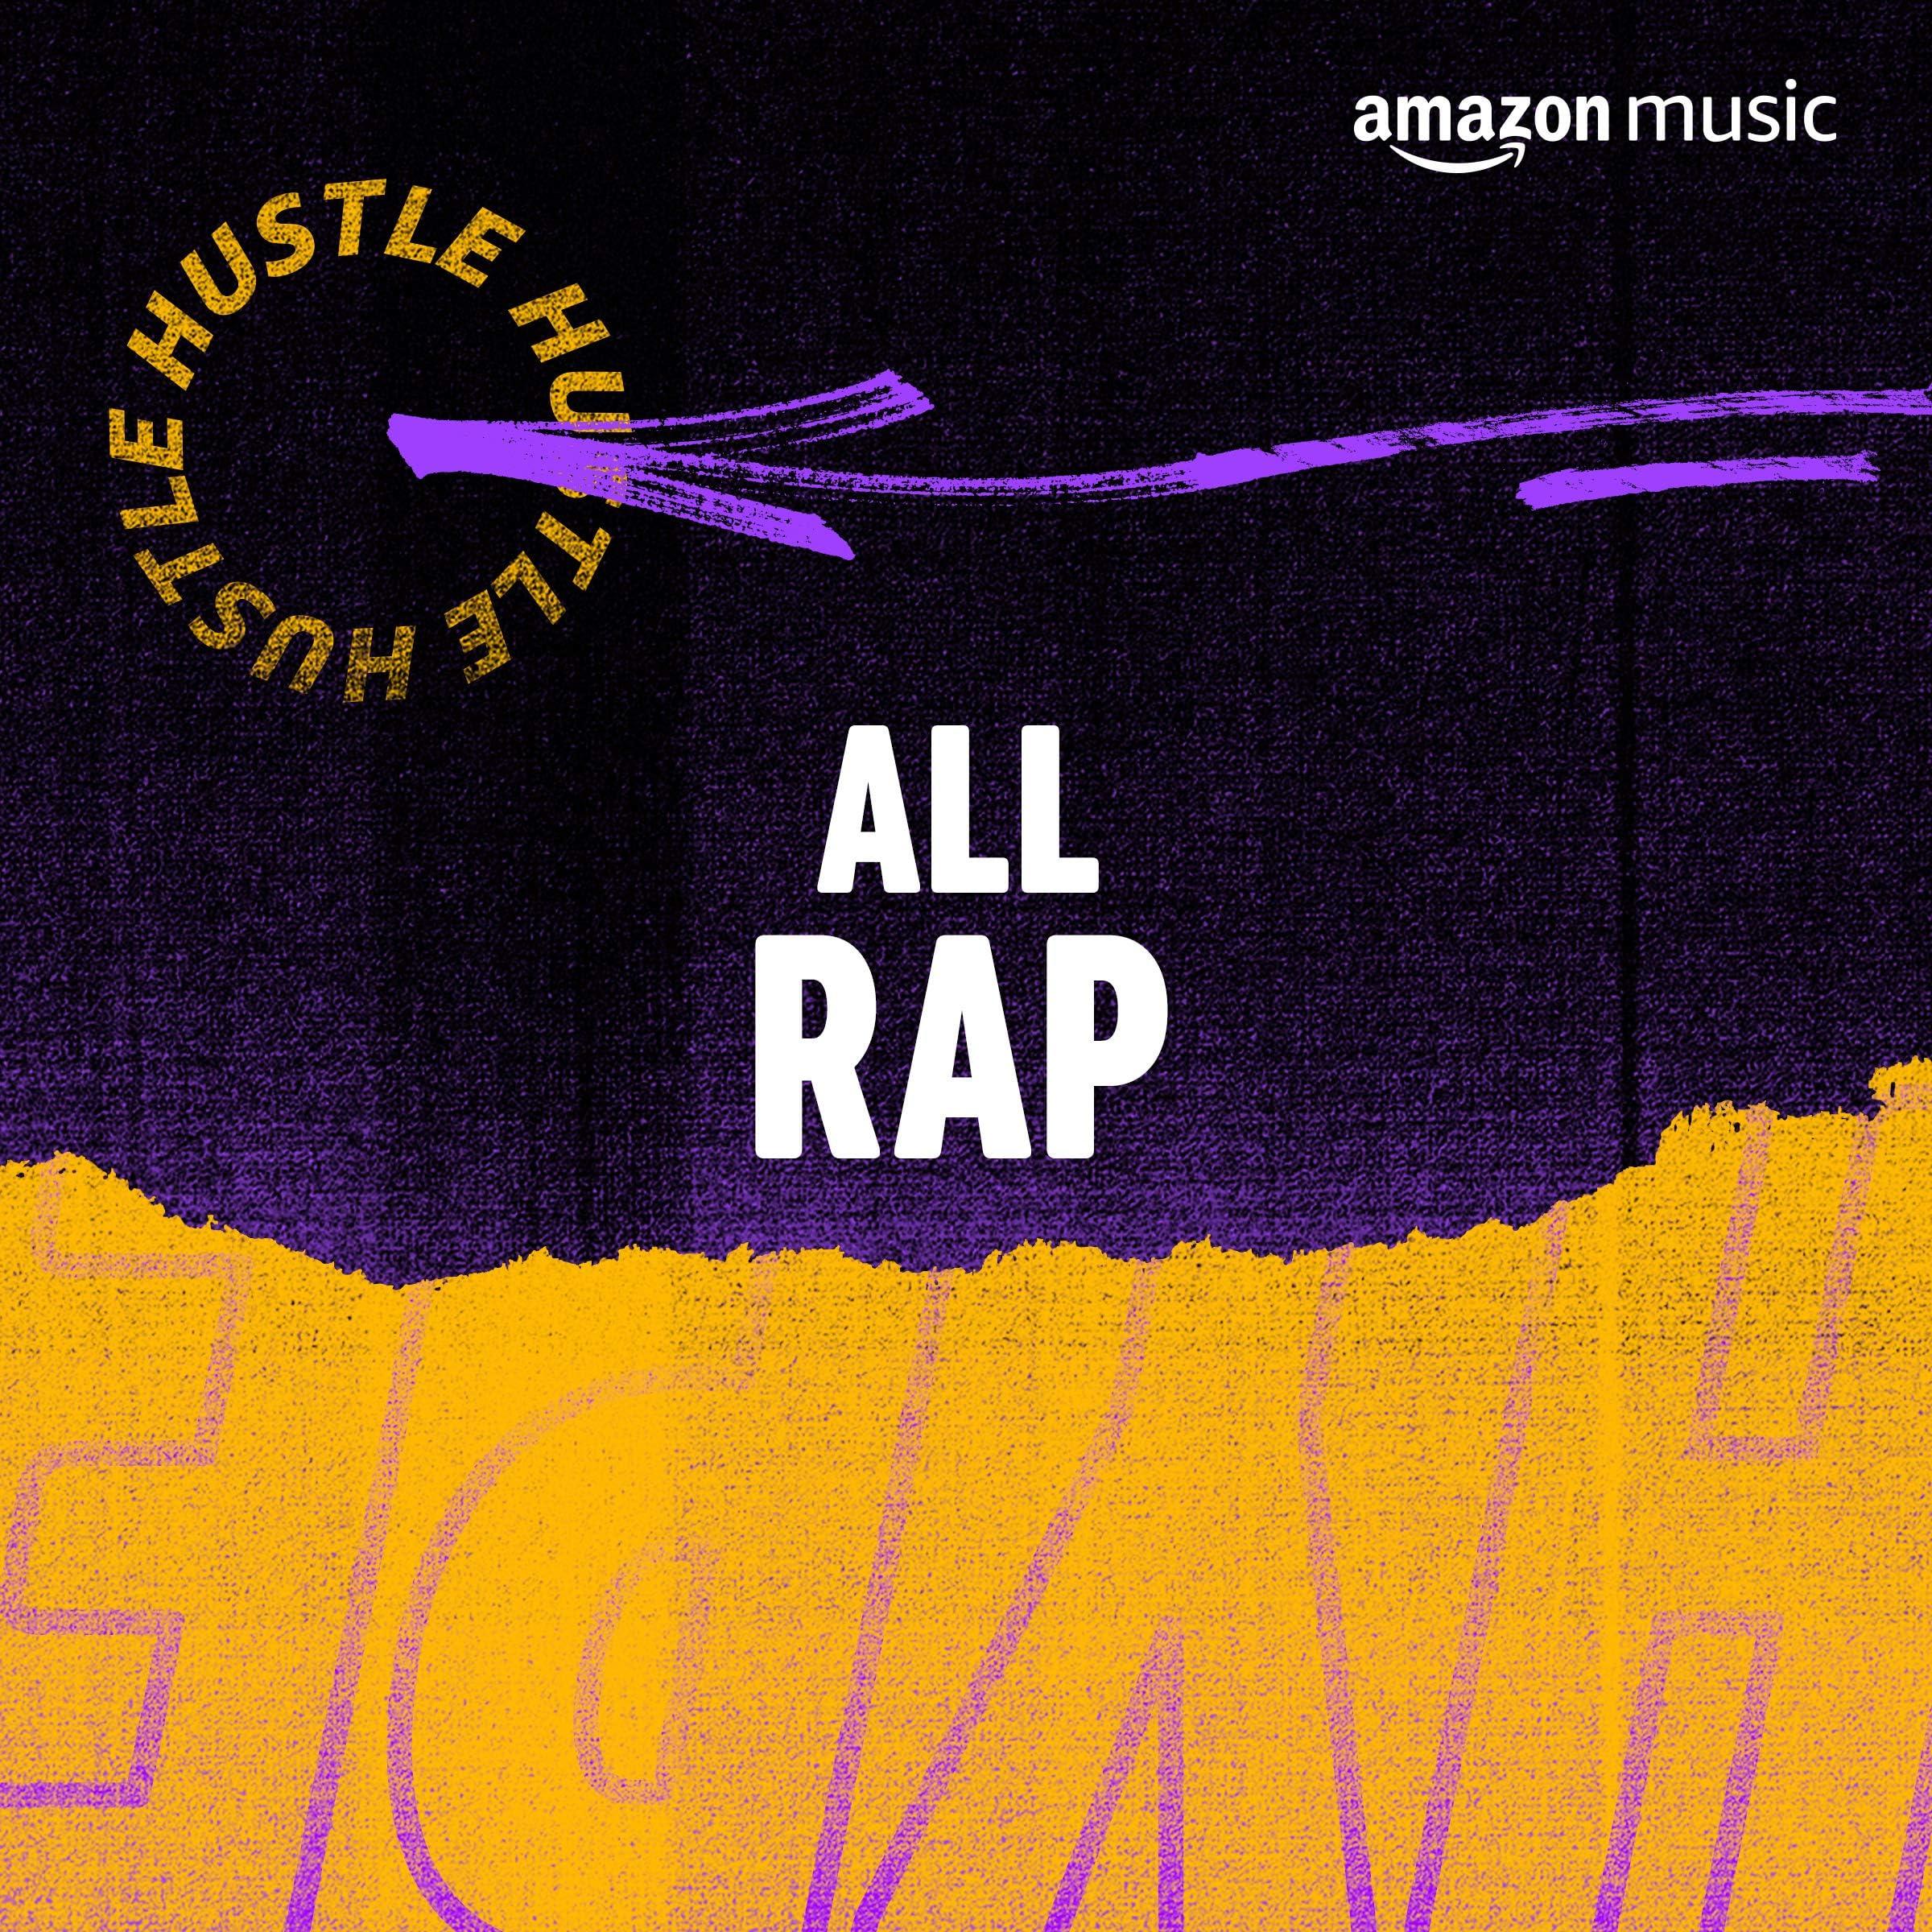 All Rap